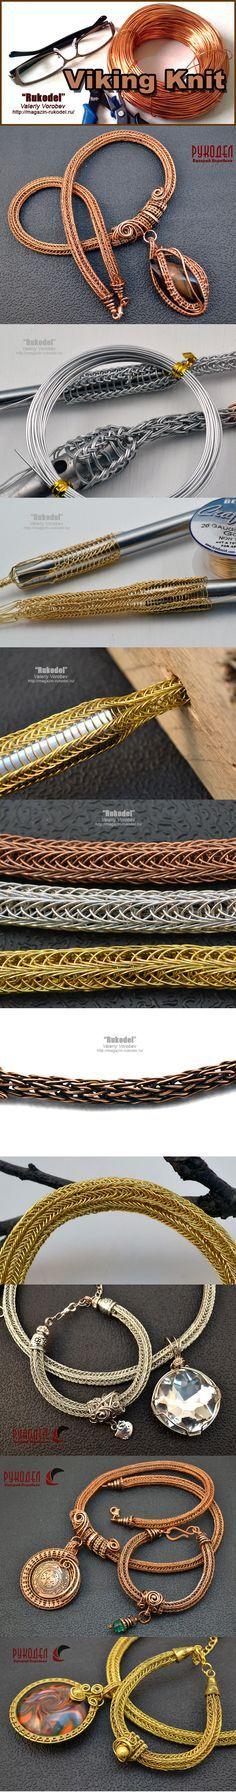 Viking Knit - http://magazin-rukodel.ru/                                                                                                                                                                                 More